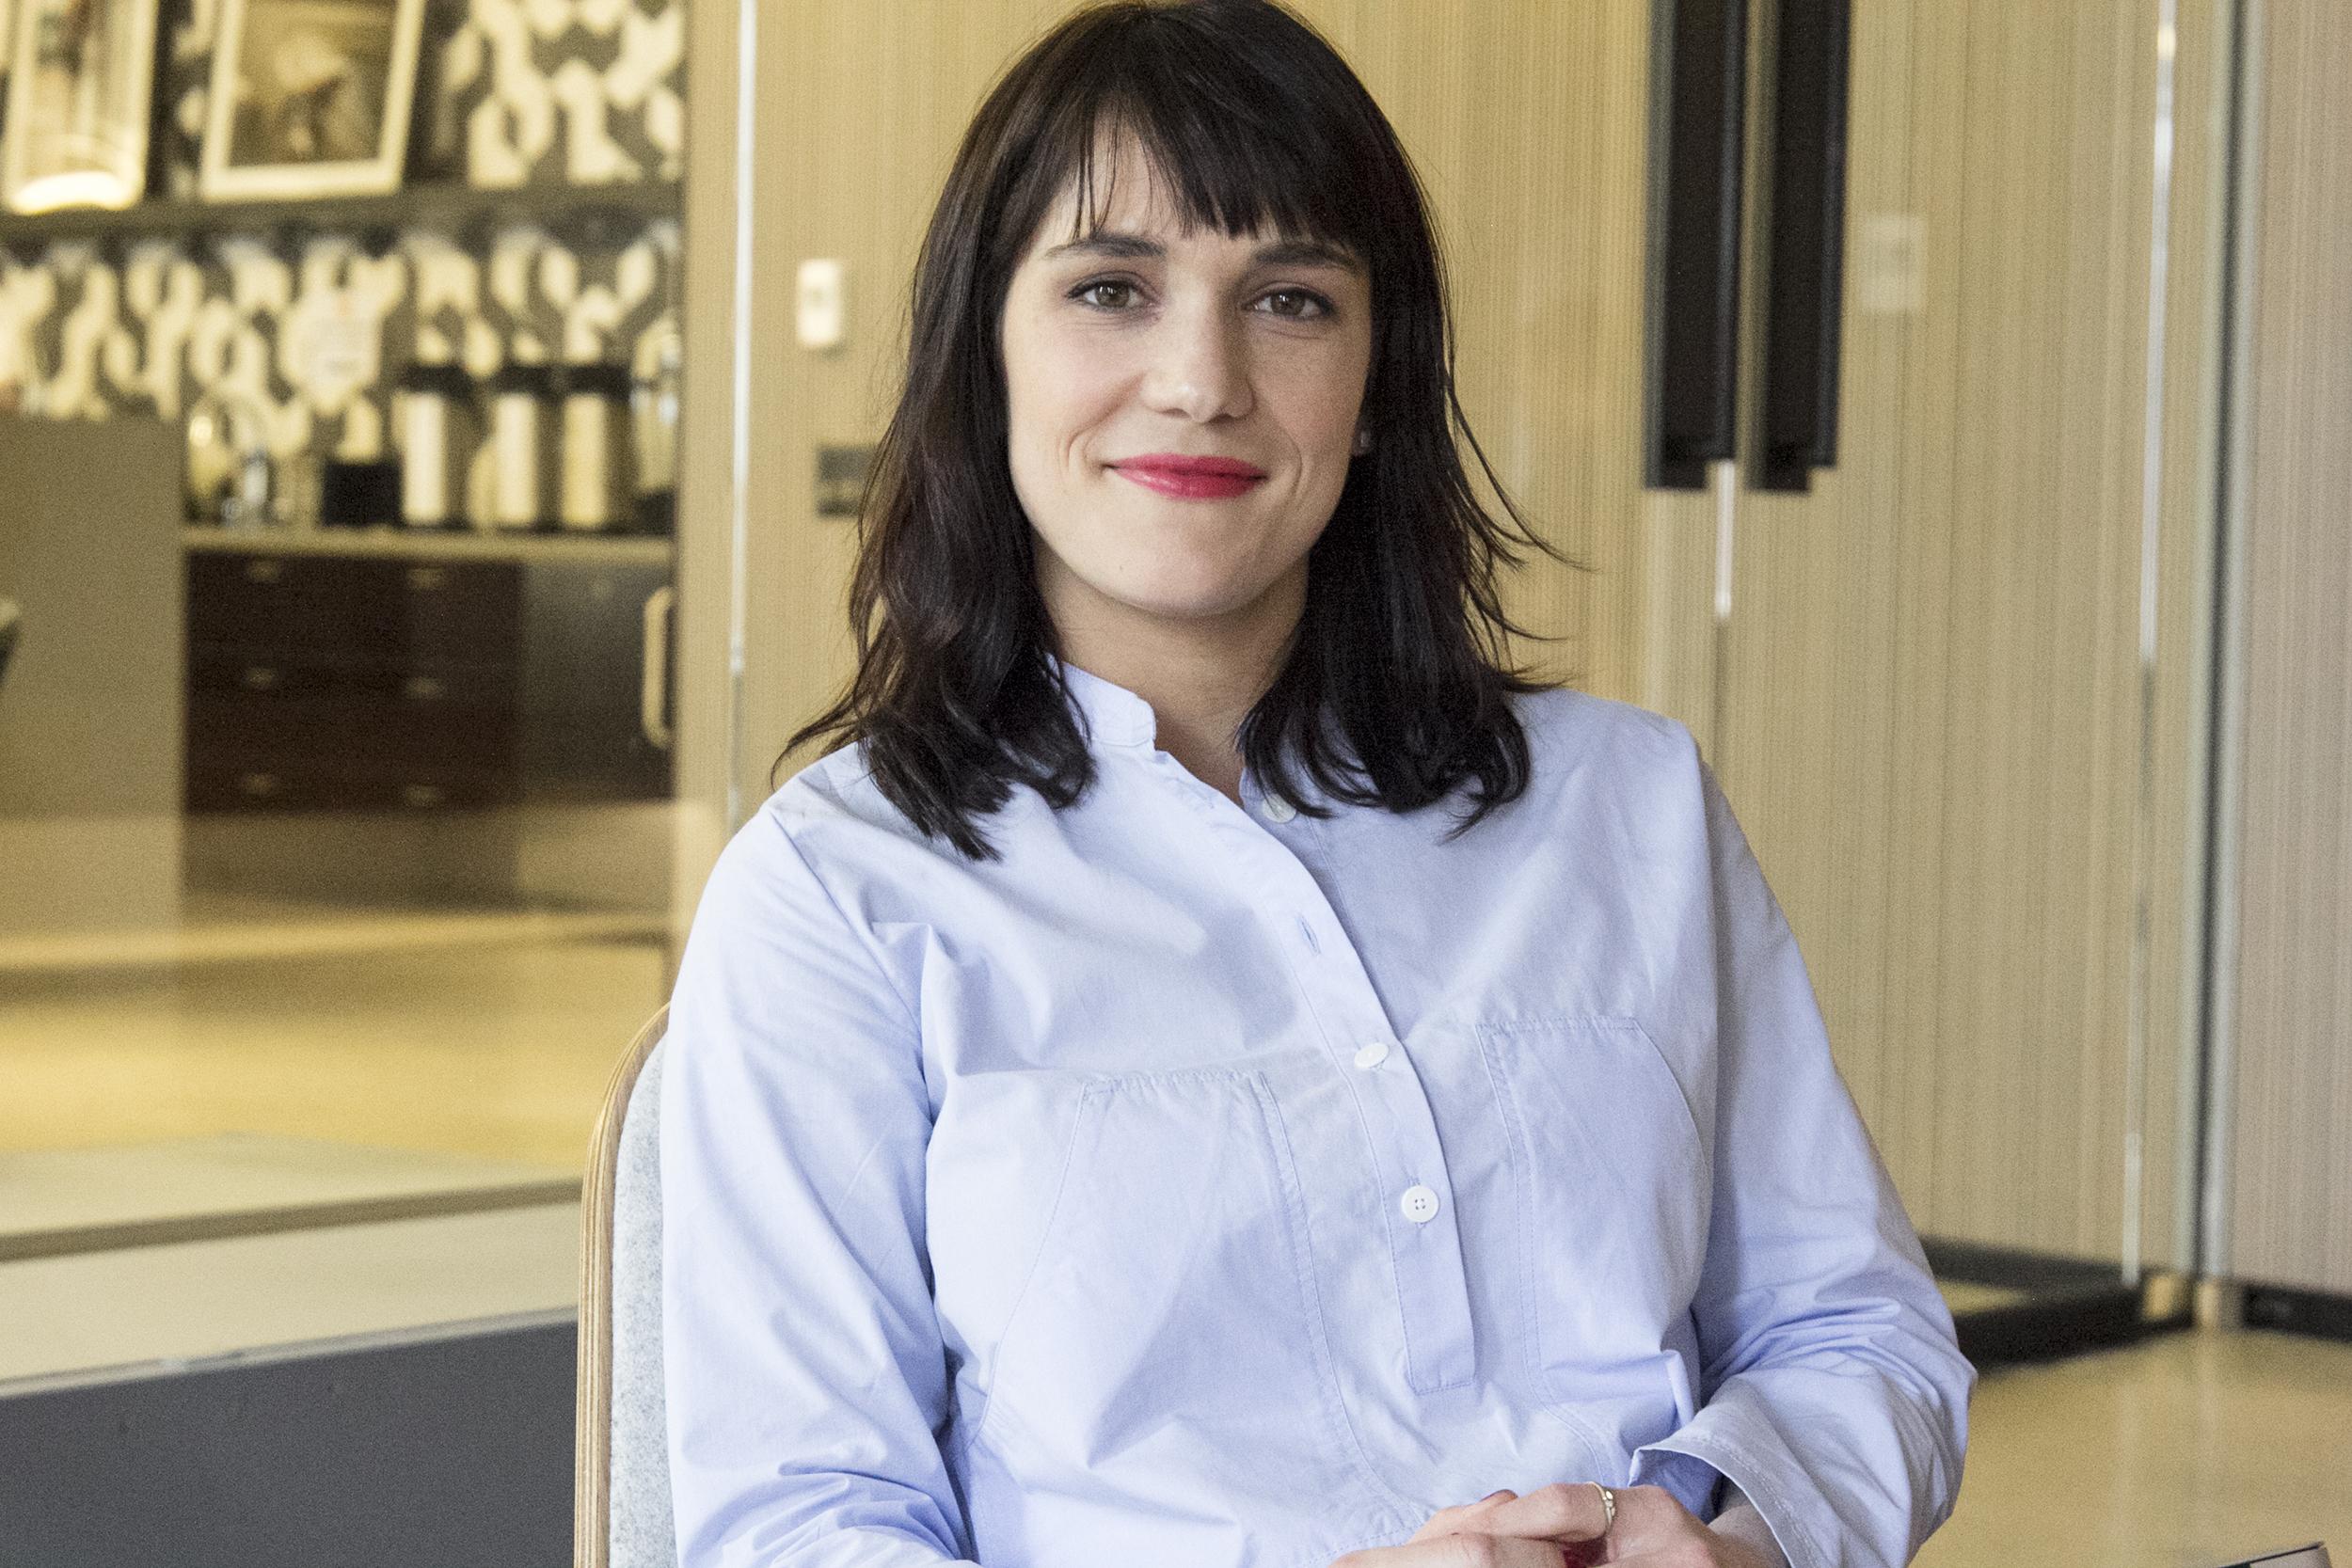 Eater editor, Amanda Kludt